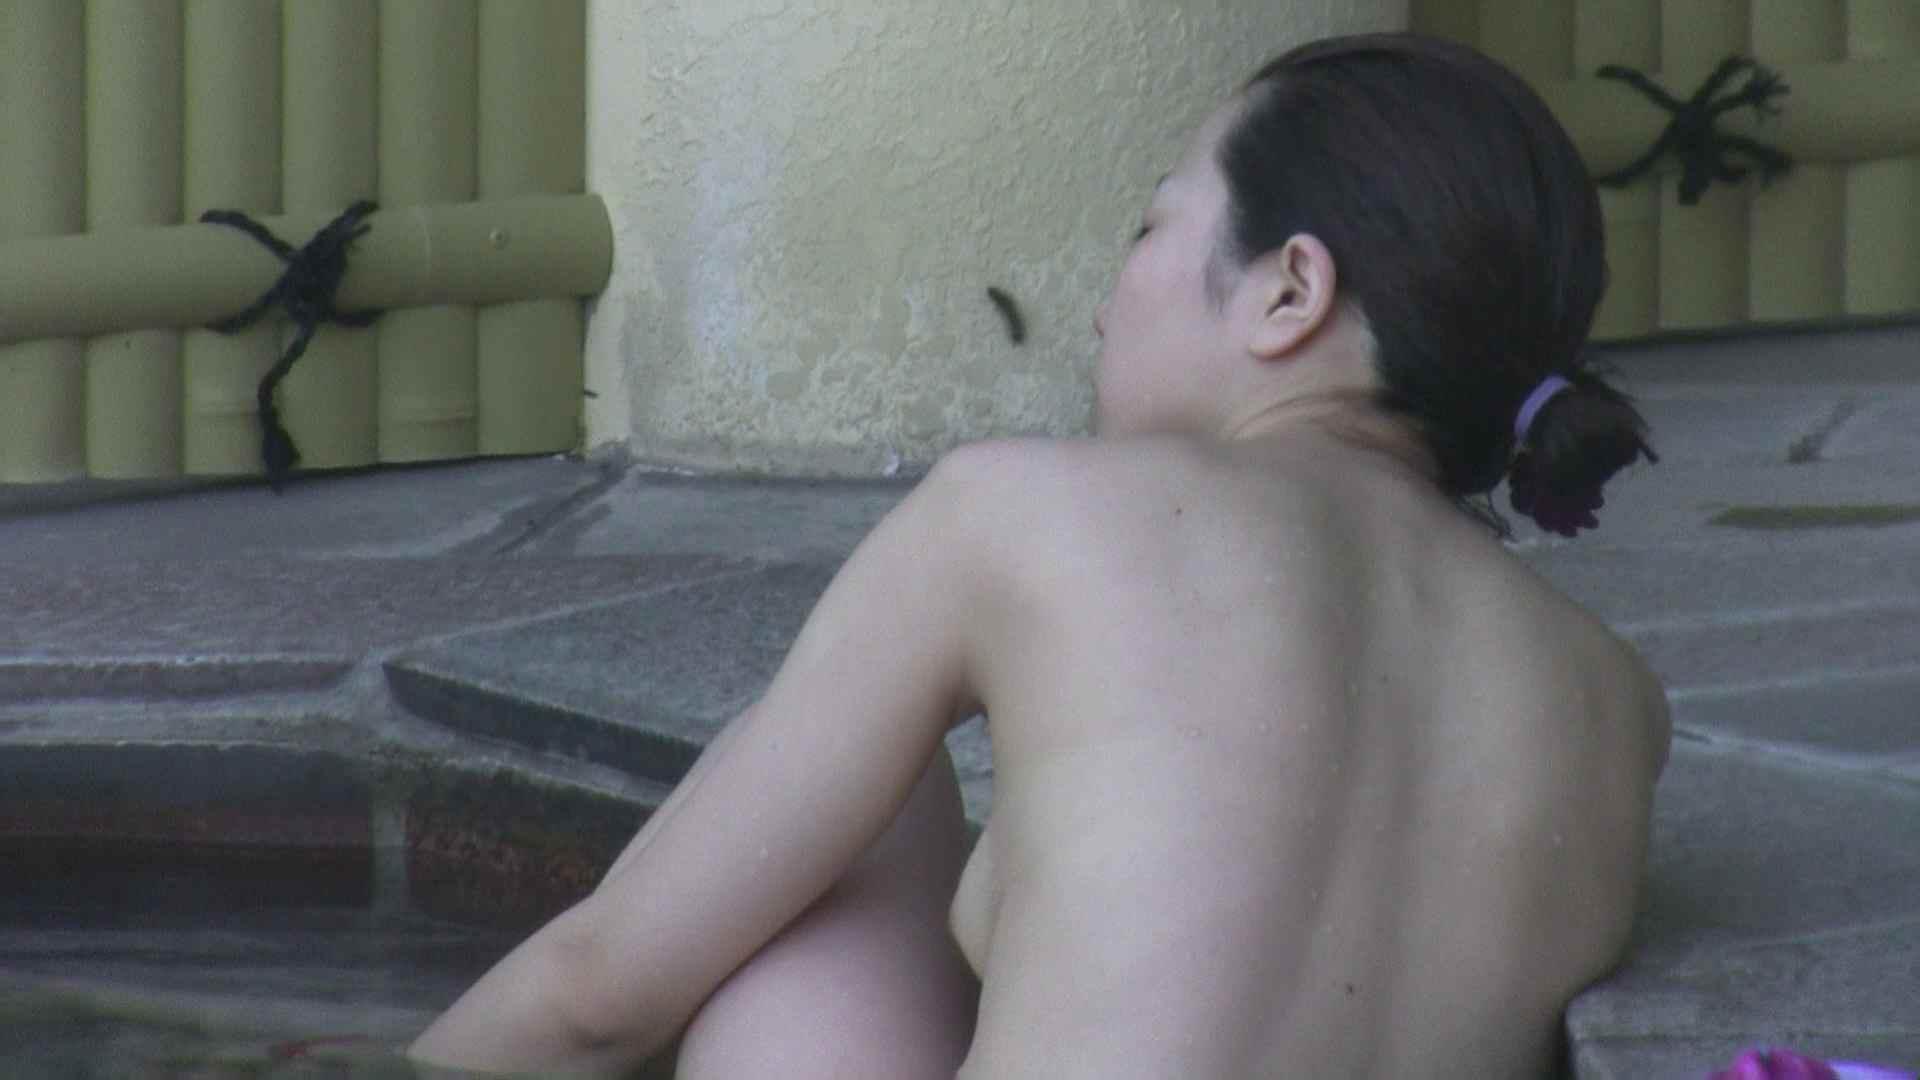 Aquaな露天風呂Vol.88【VIP限定】 綺麗なOLたち  57枚 48